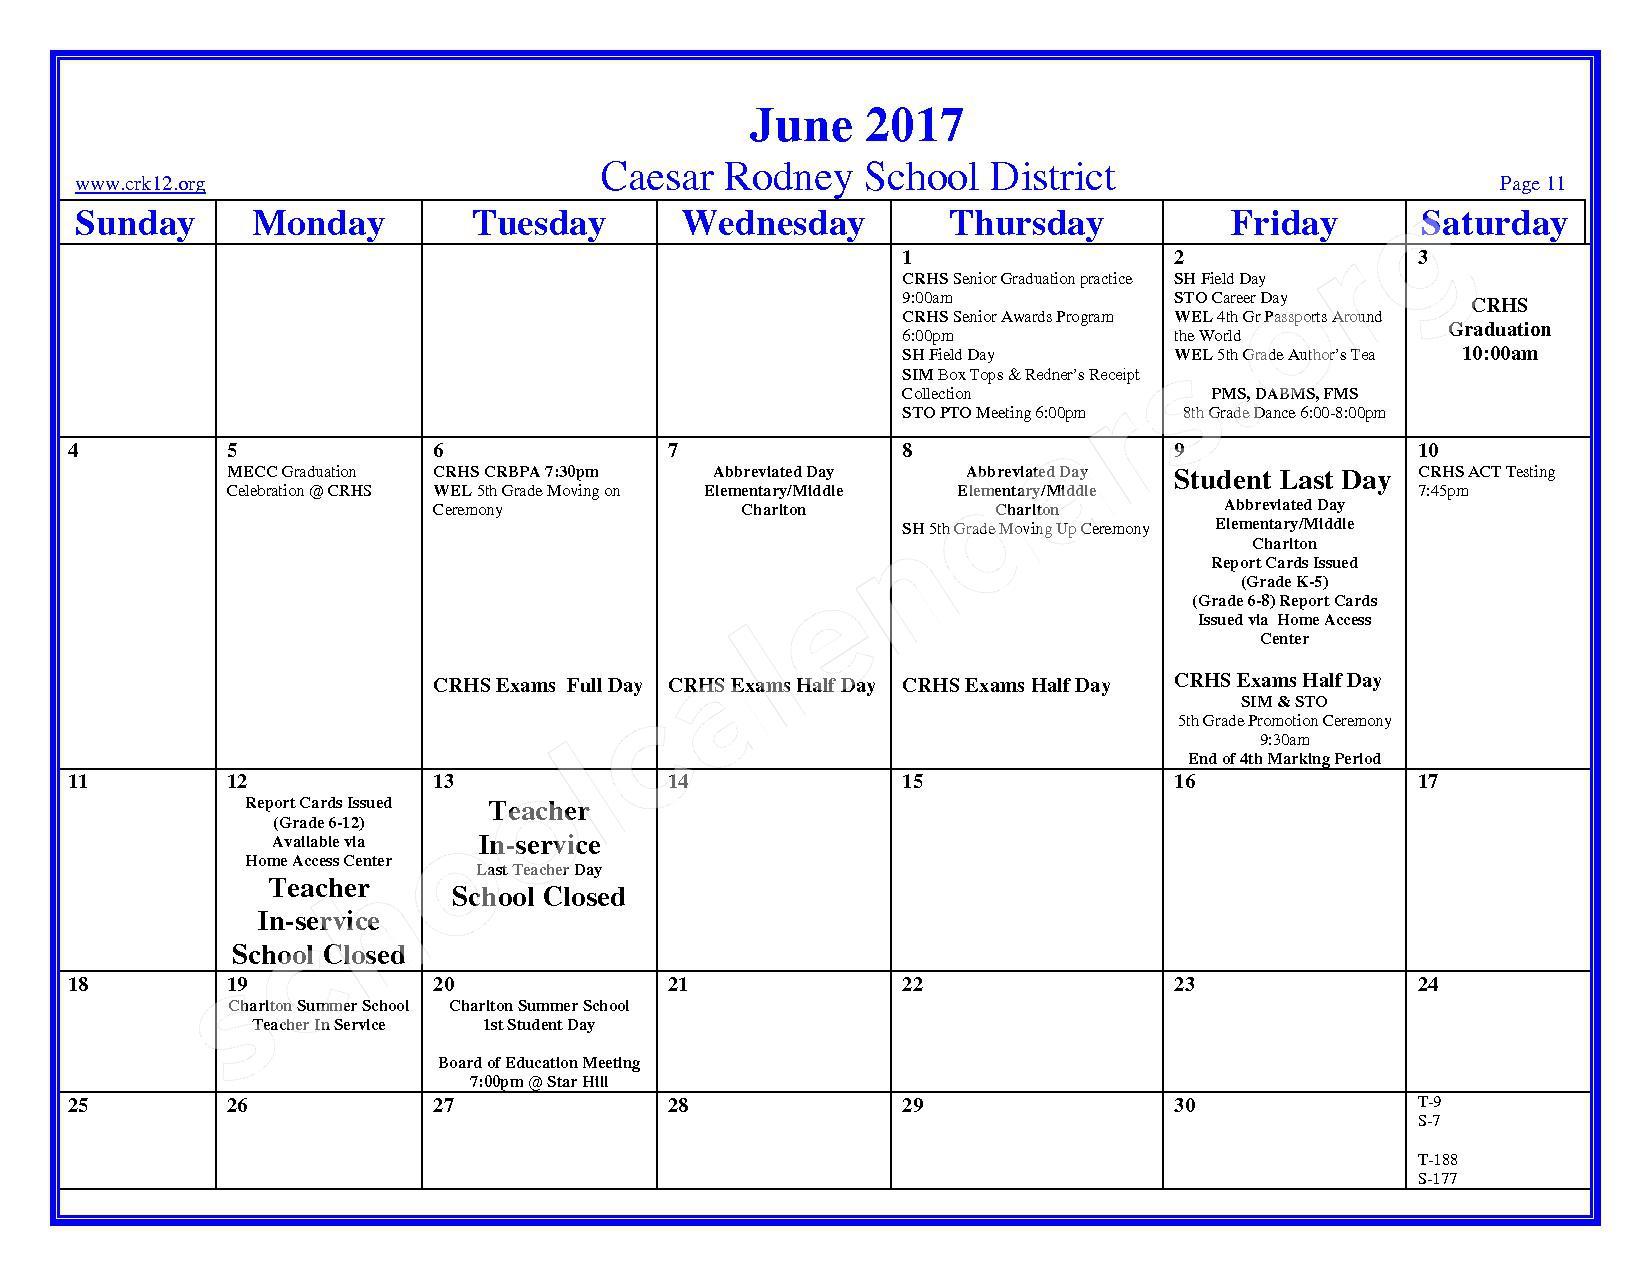 2016 - 2017 School Calendar – Brown (W. Reily) Elementary School – page 11